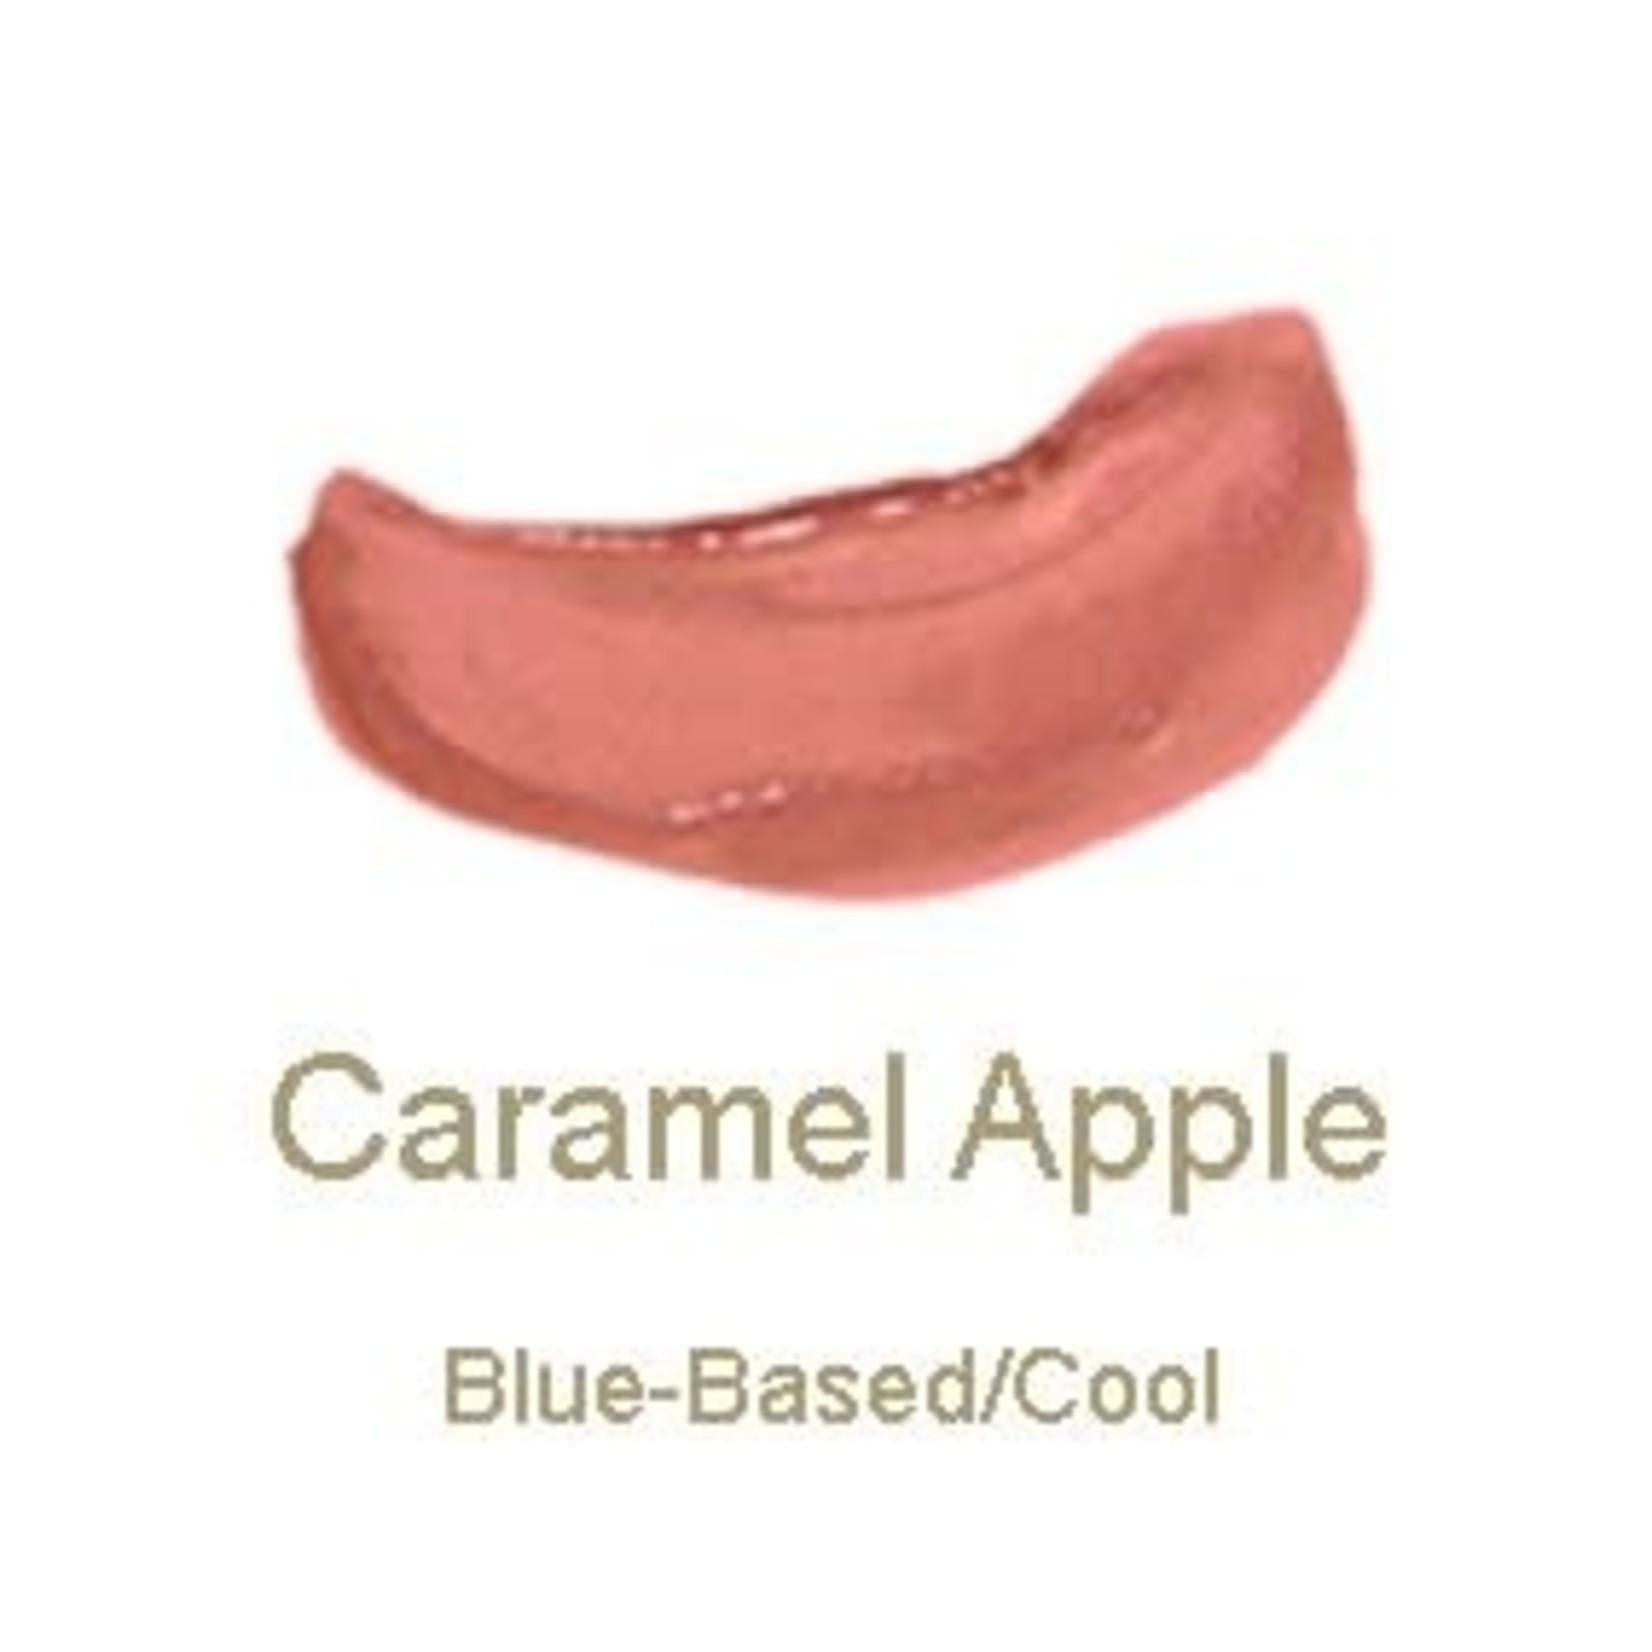 SeneGence LipSense Caramel Apple